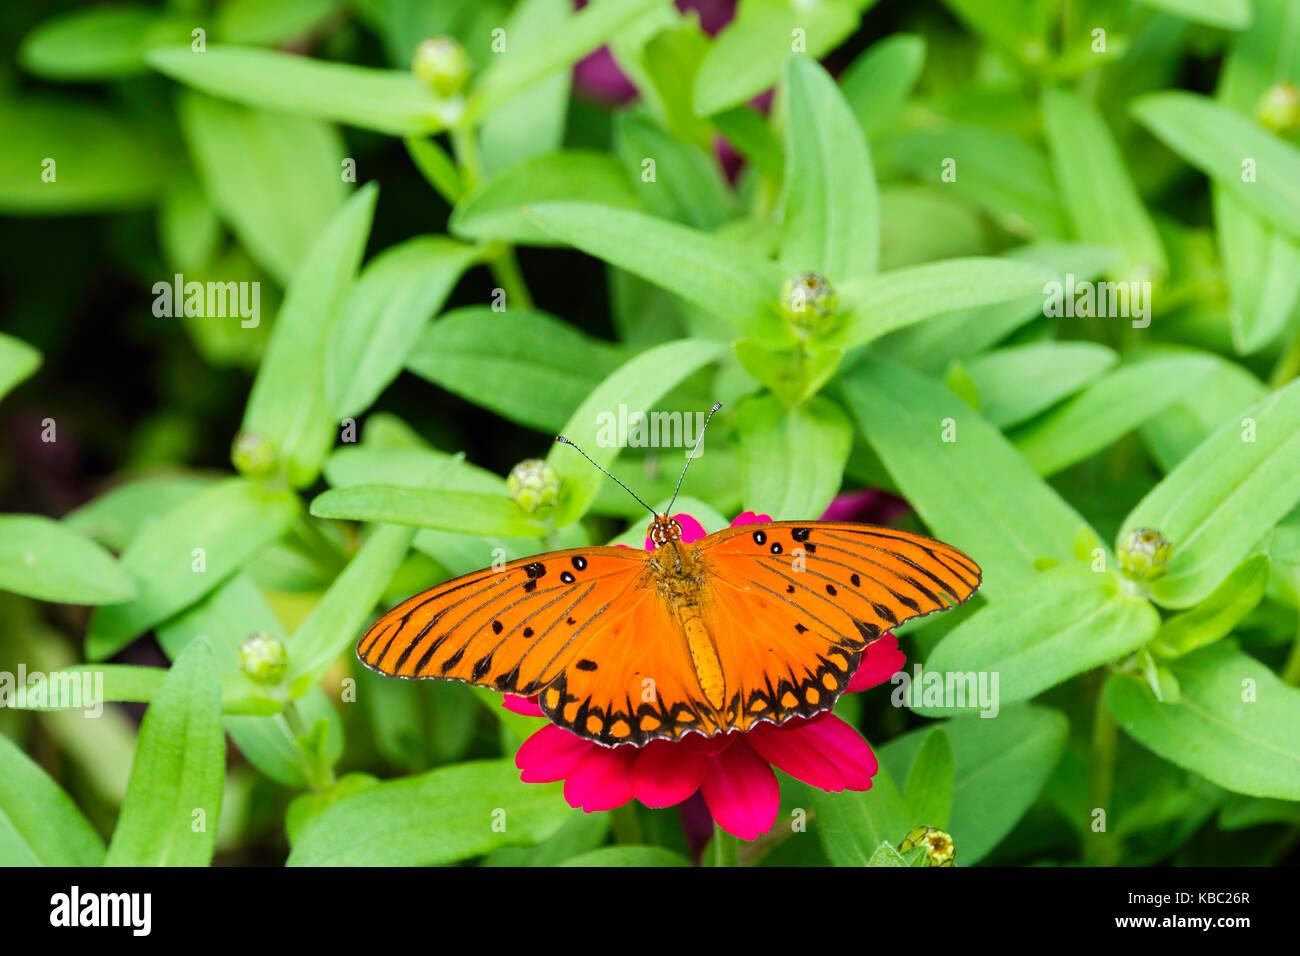 Gulf Fritillary butterfly,Agraulis vanillae, nectaring on pink zinna elegans. Oklahoma, USA. - Stock Image